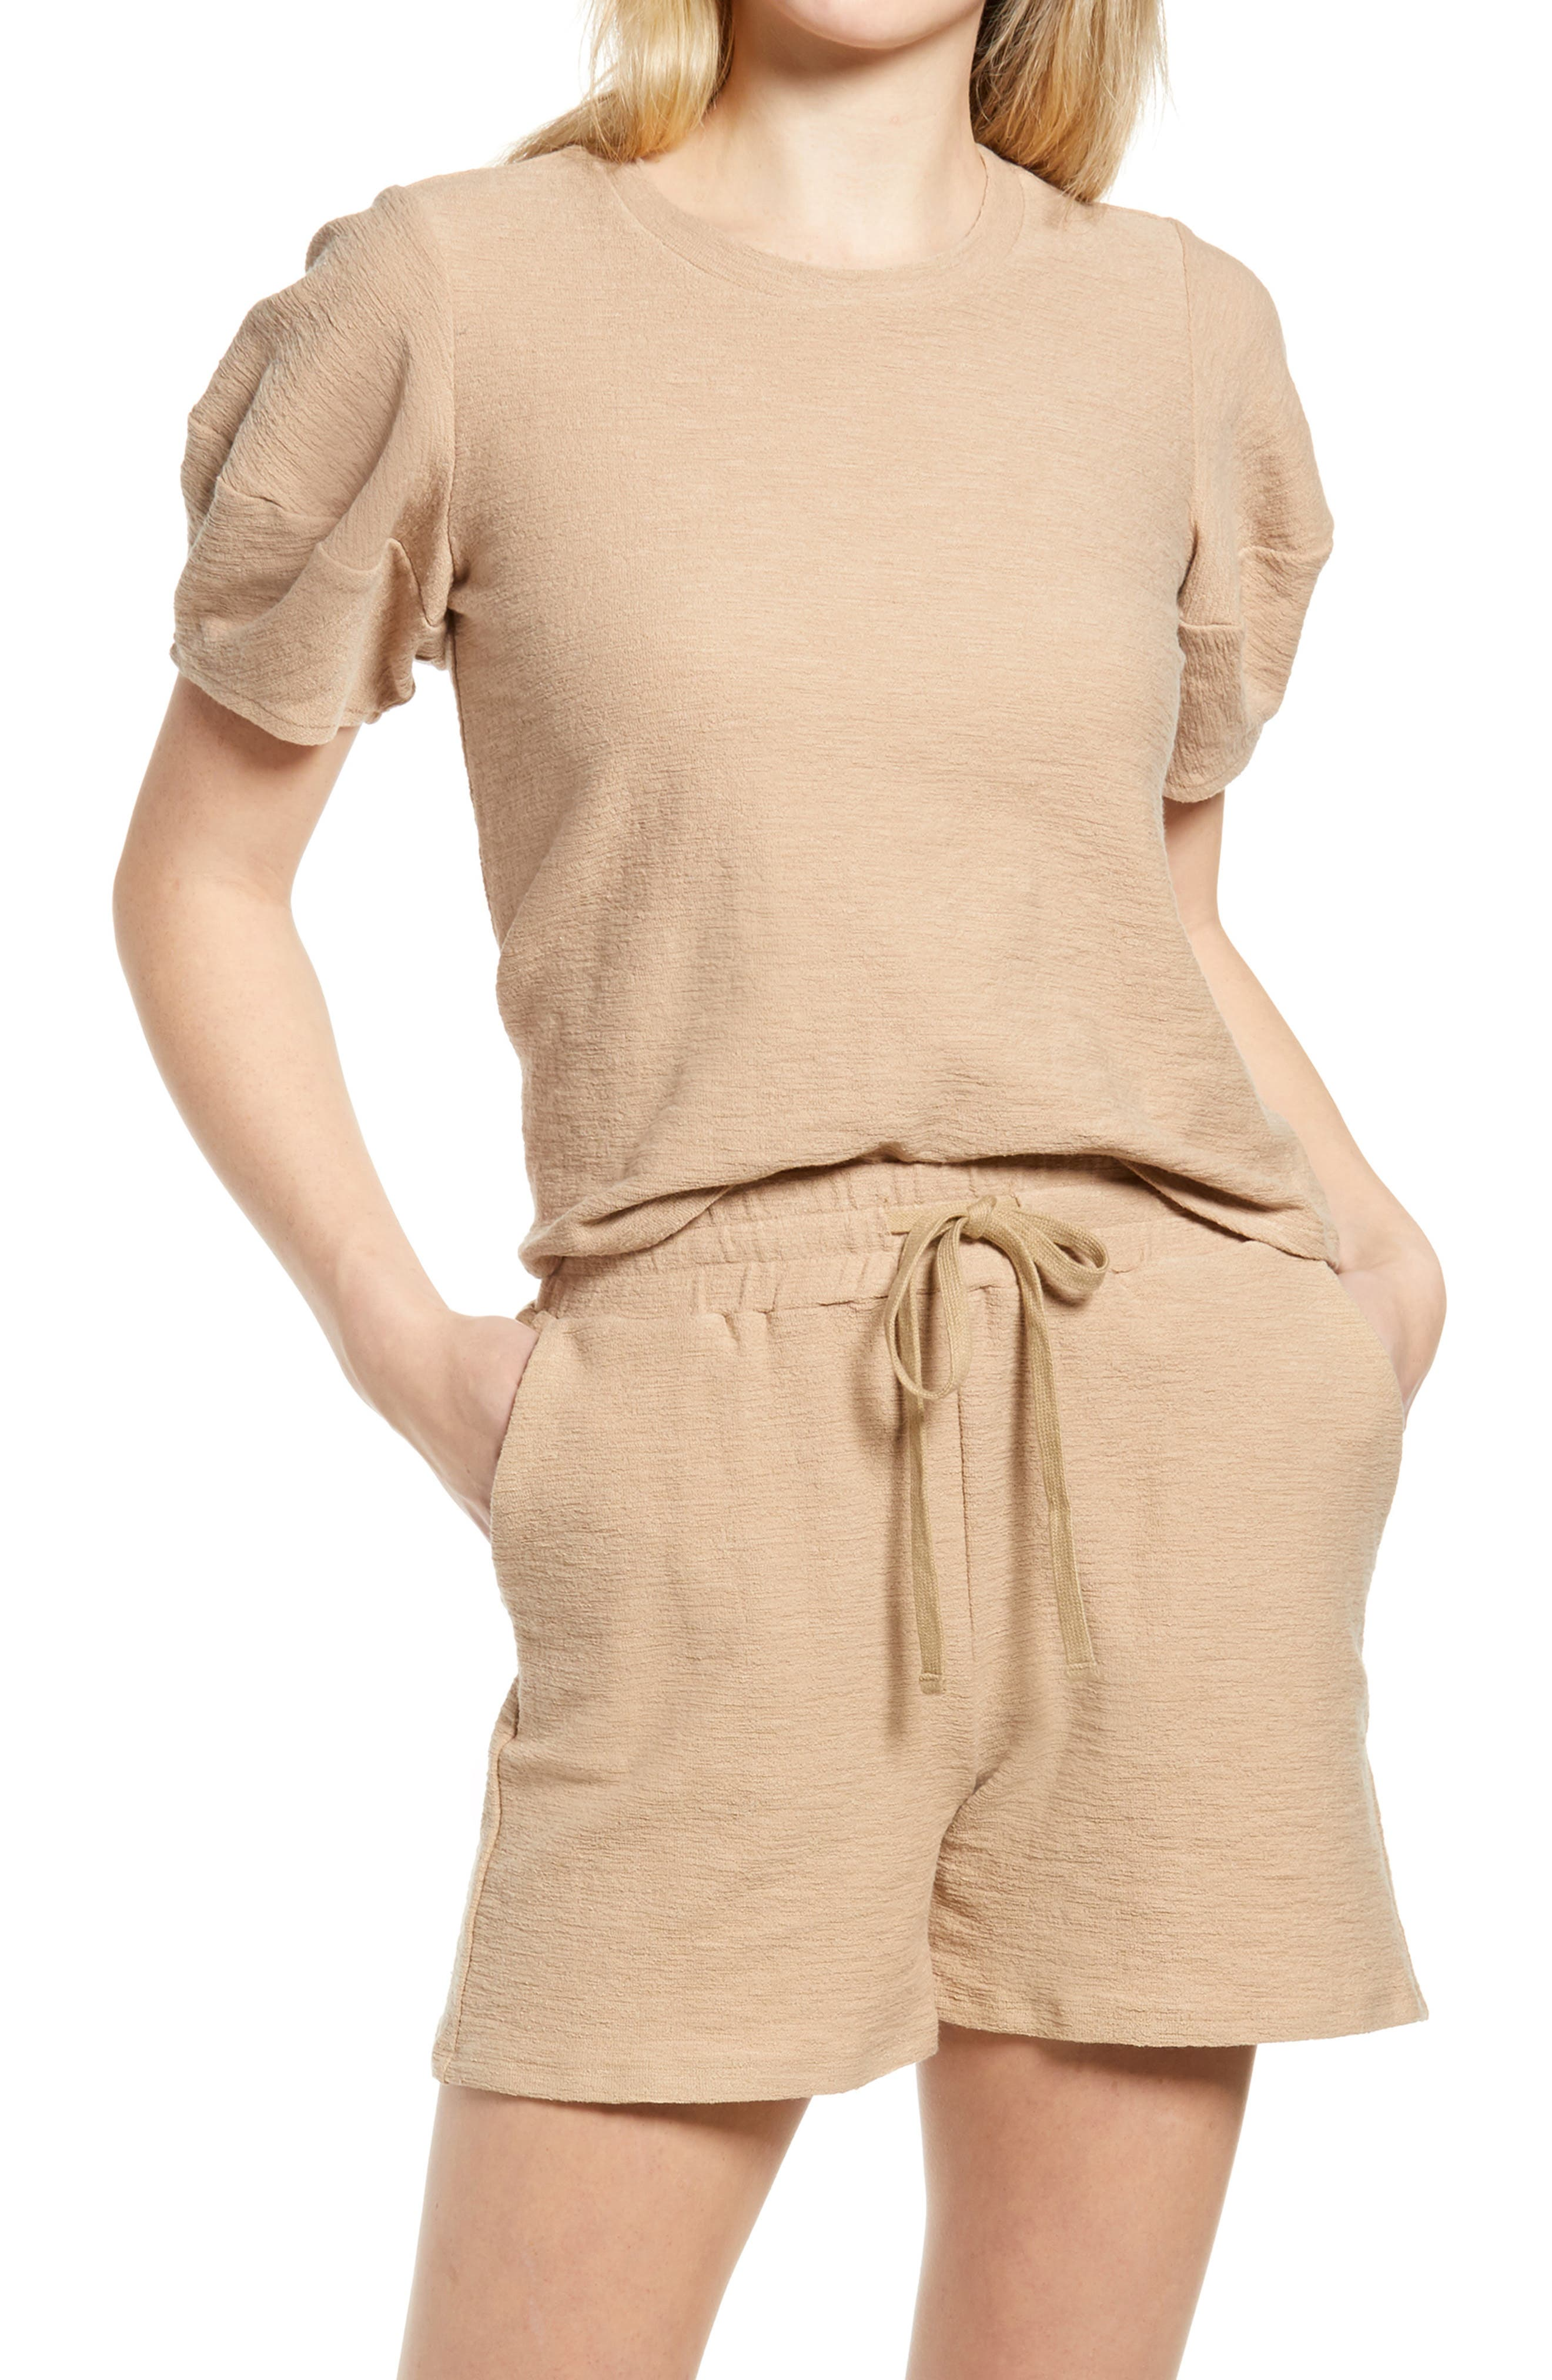 Mojito Textured Puff Sleeve T-Shirt